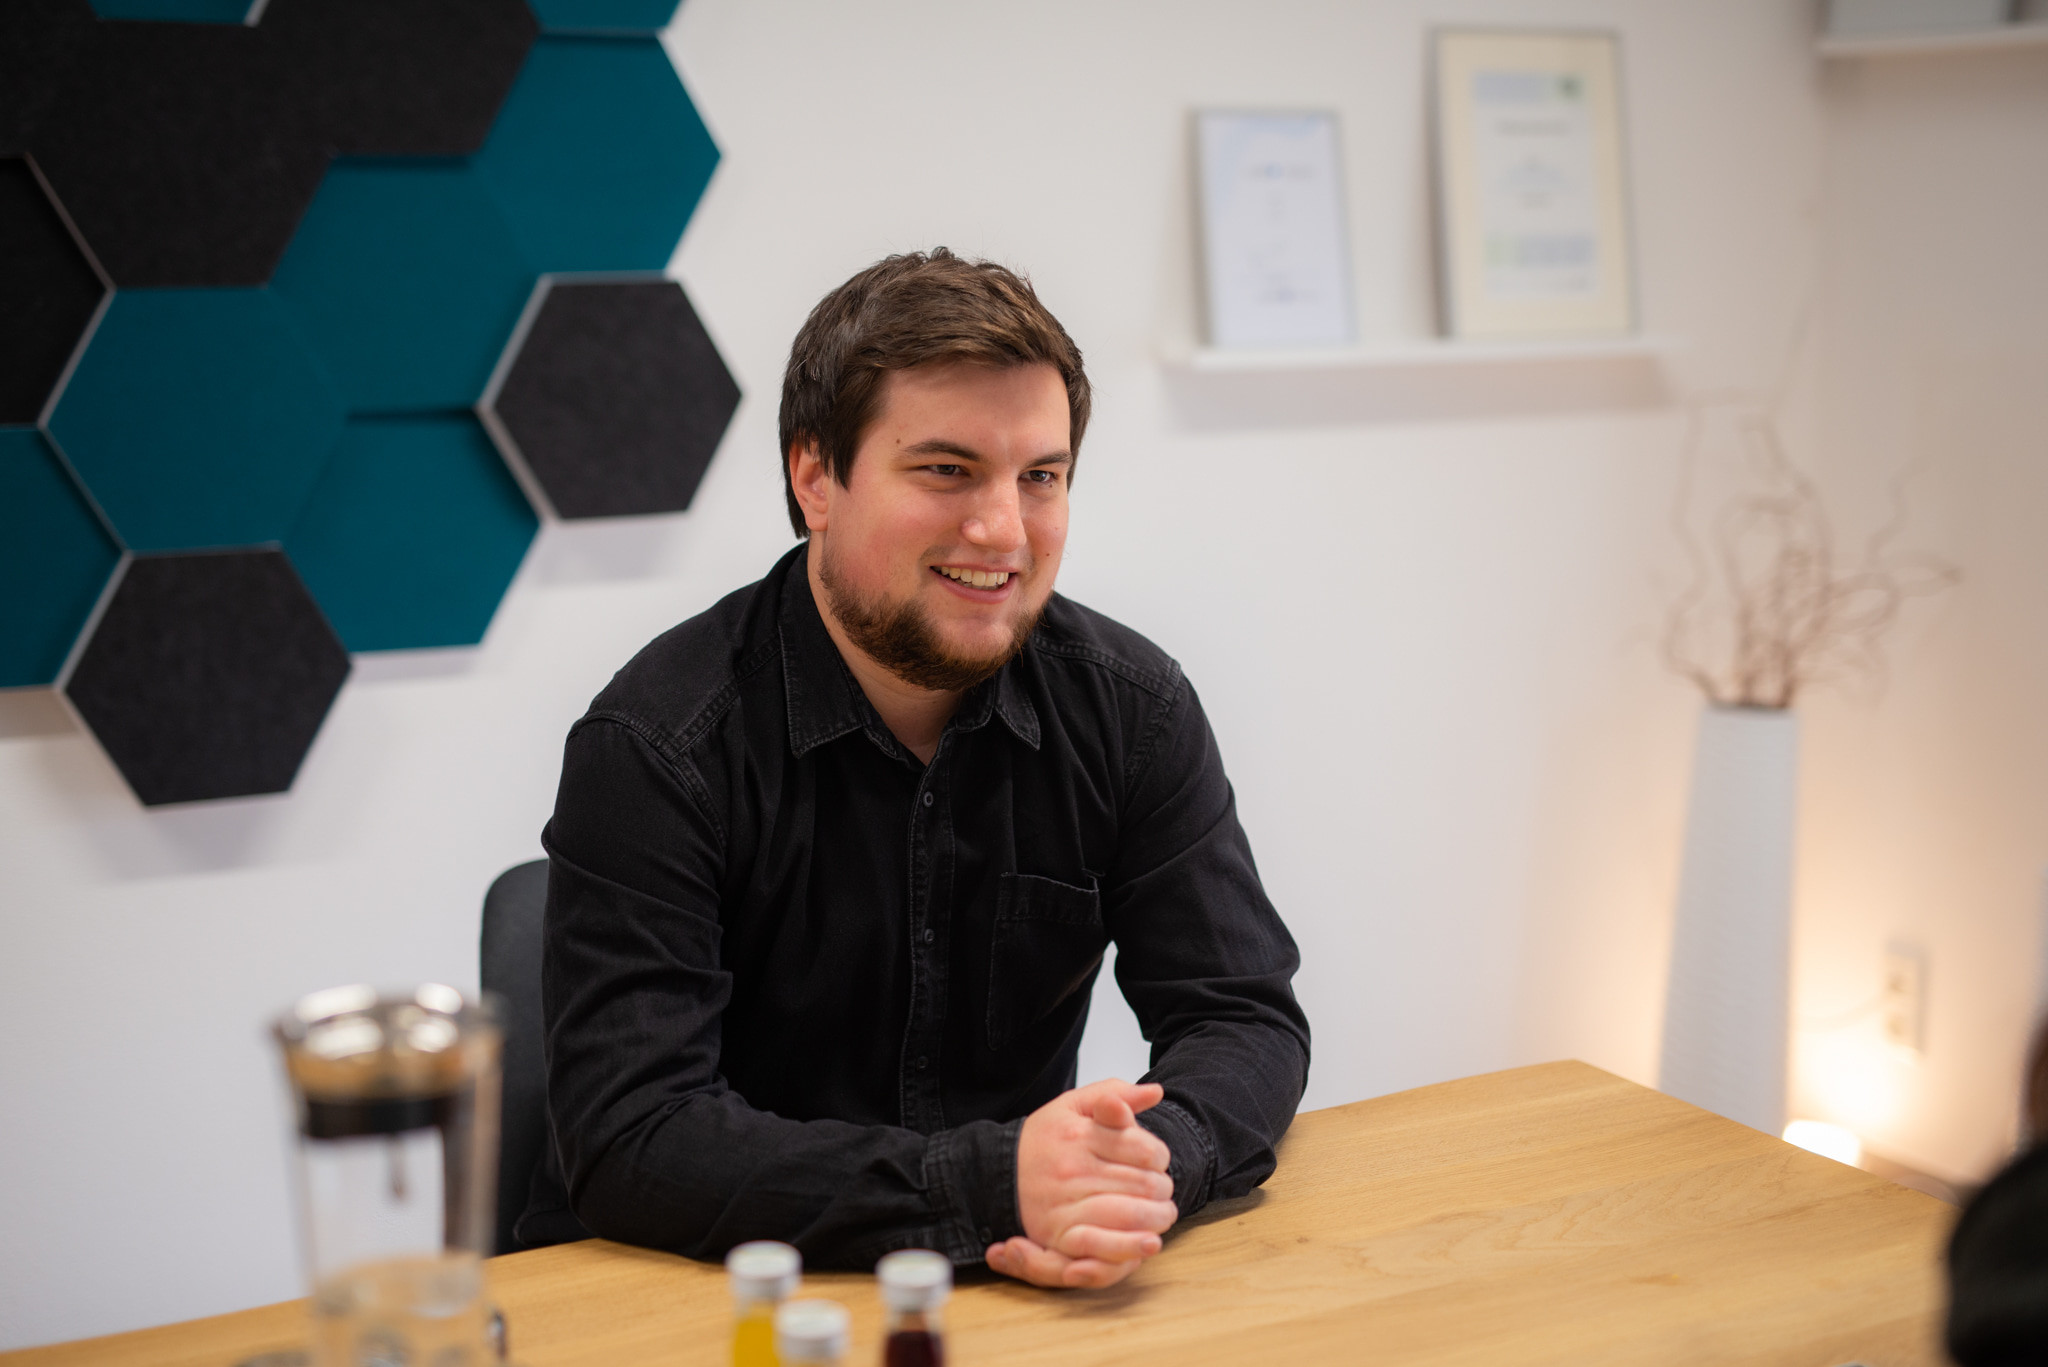 Sebastian Gottschlich in rooom office